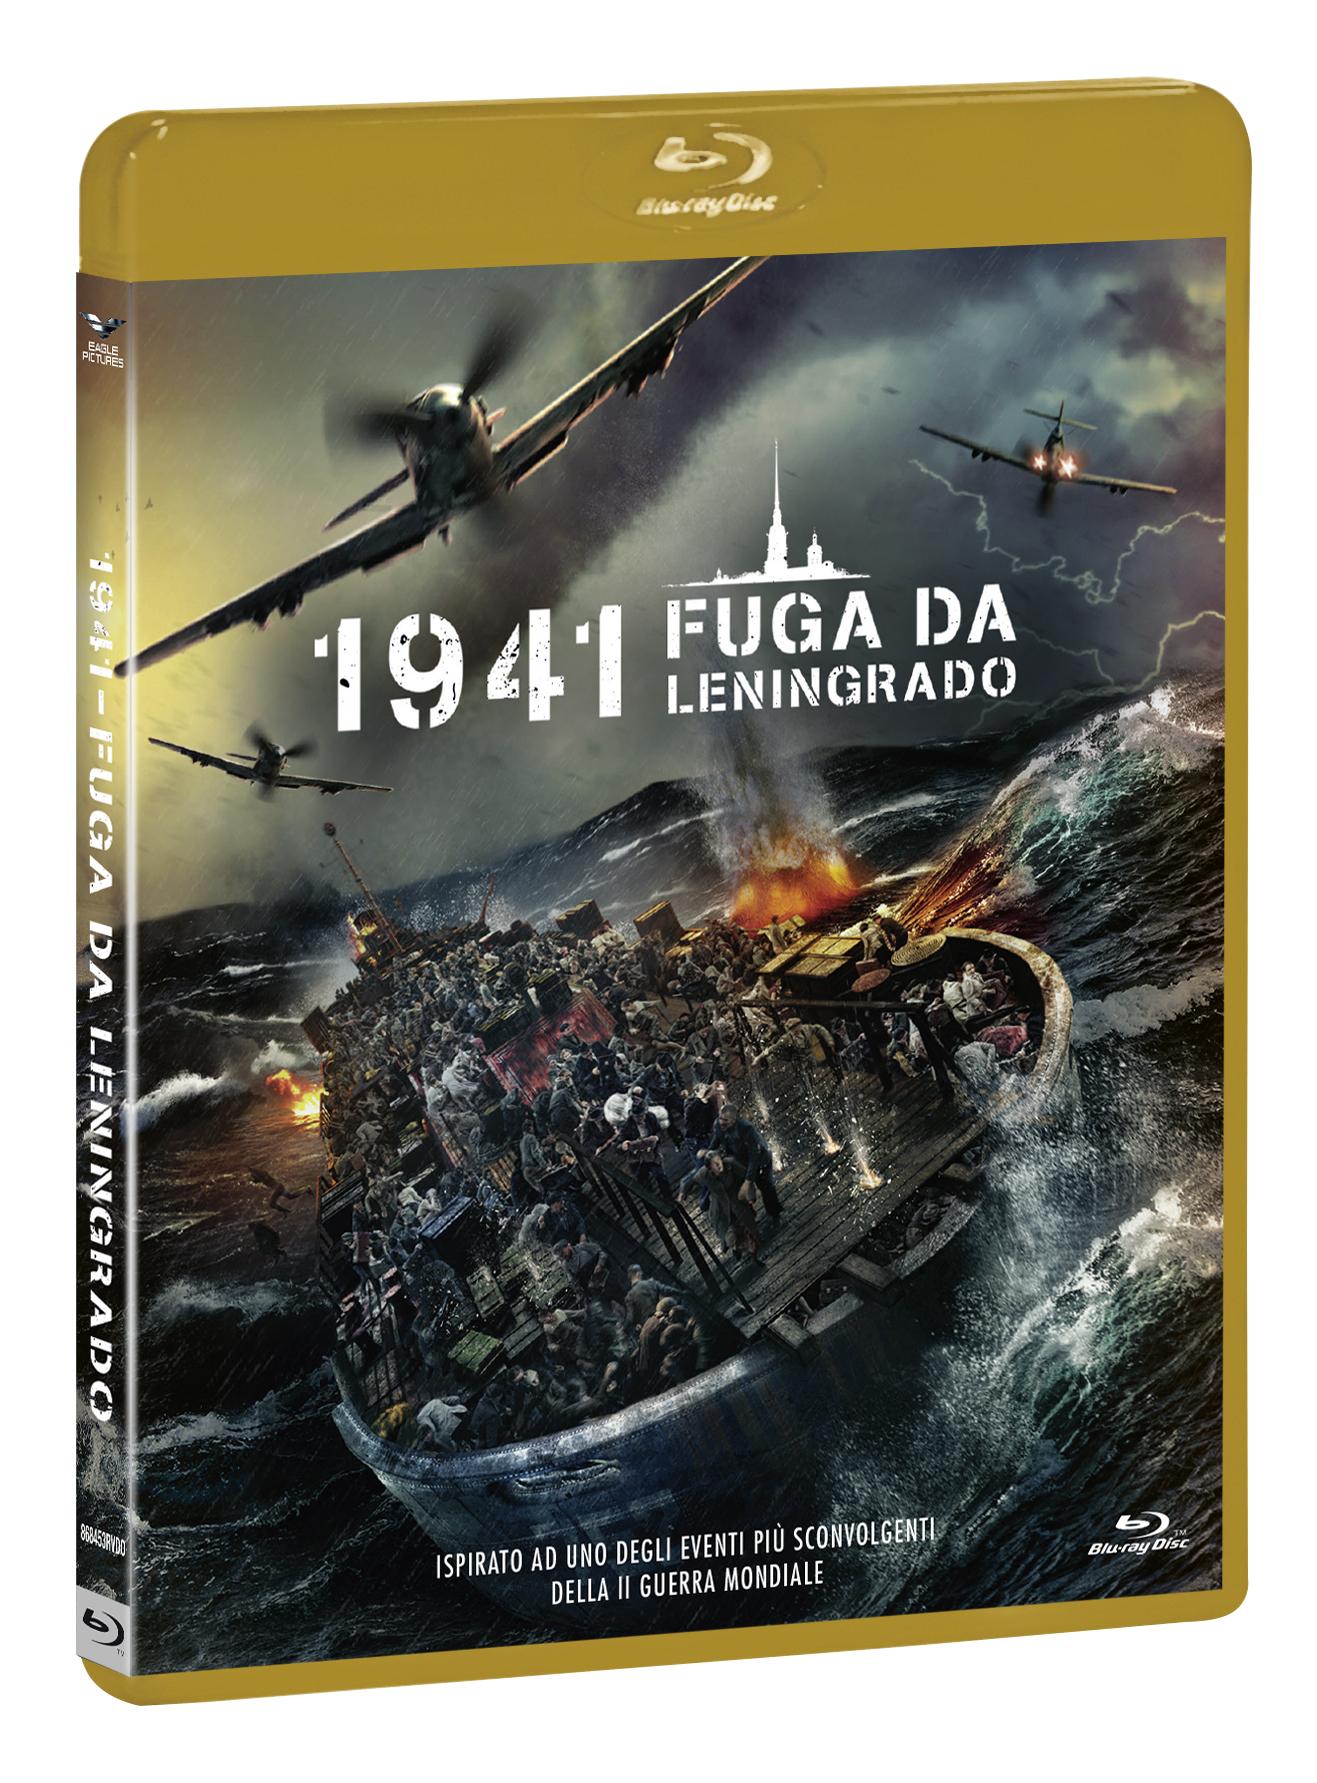 1941 - FUGA DA LENINGRADO - BLU RAY